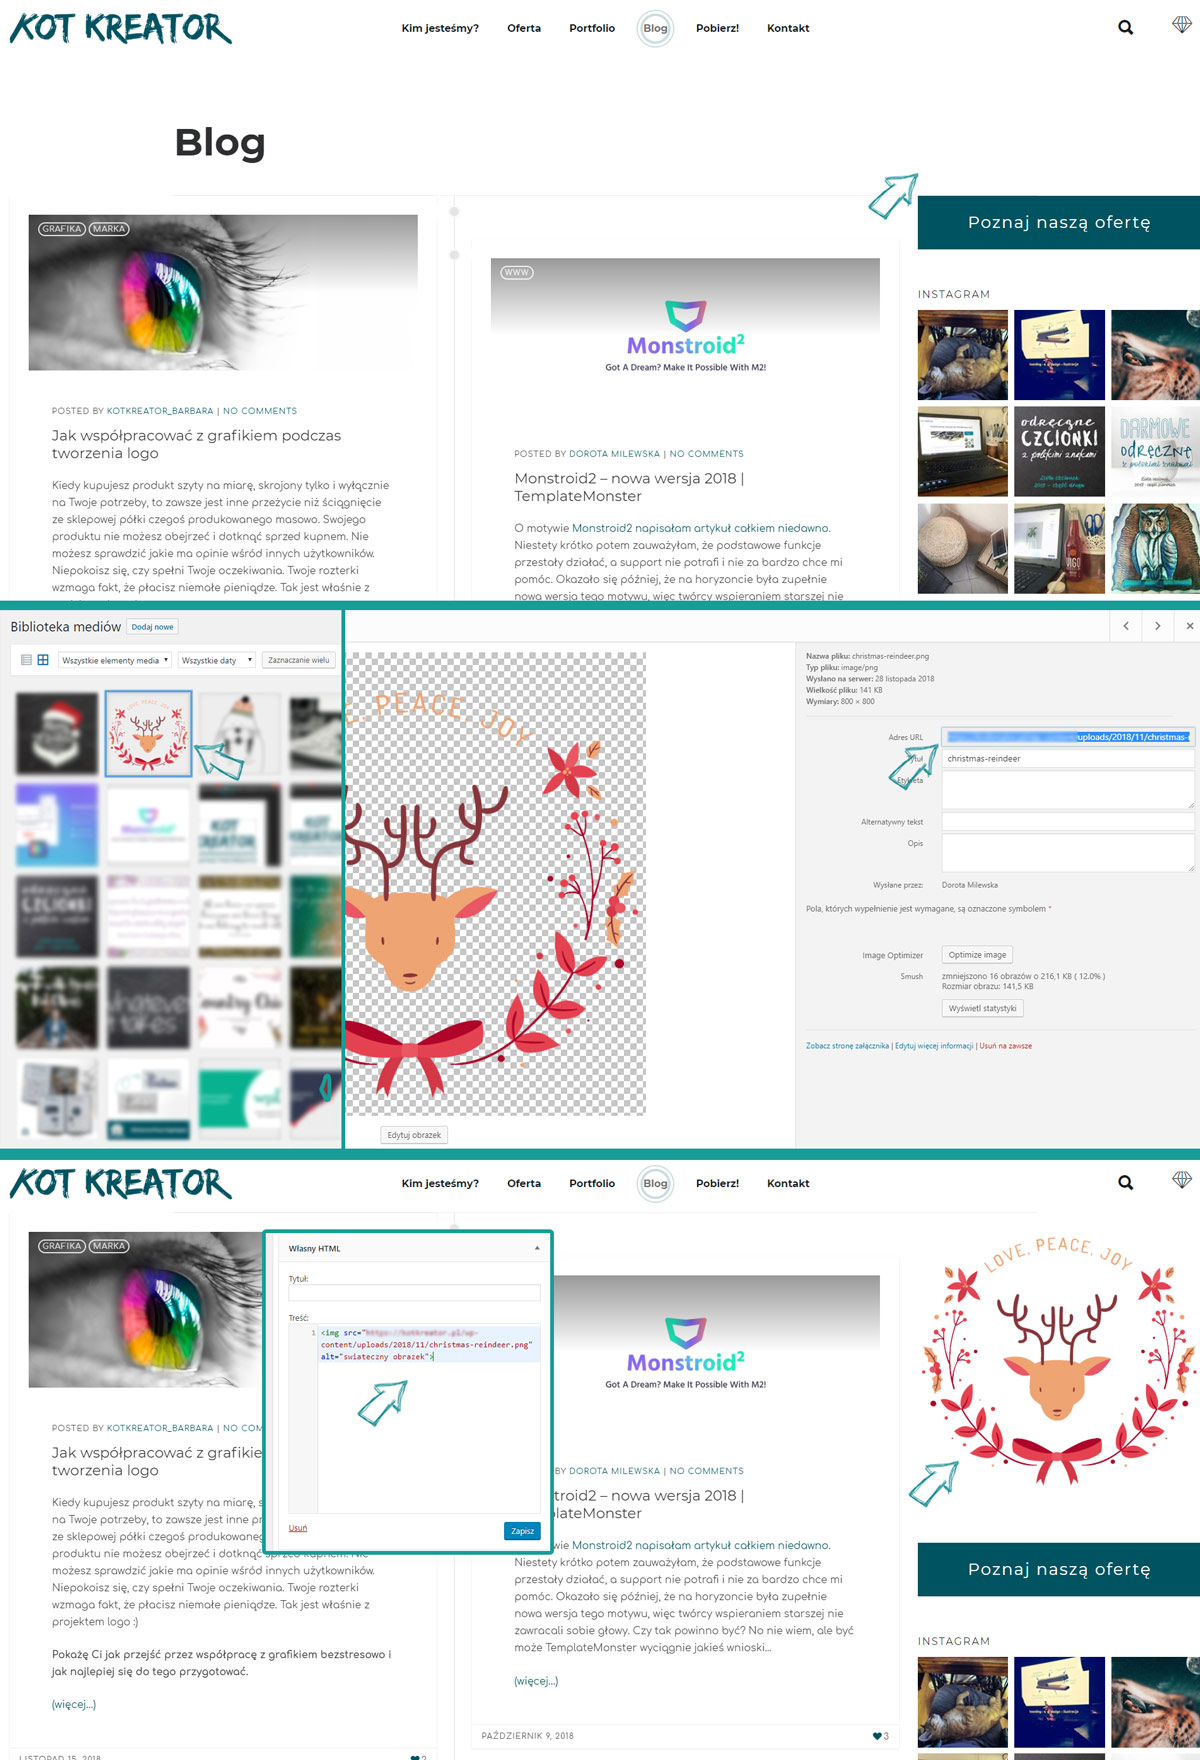 WordPress jak dodać obrazek html